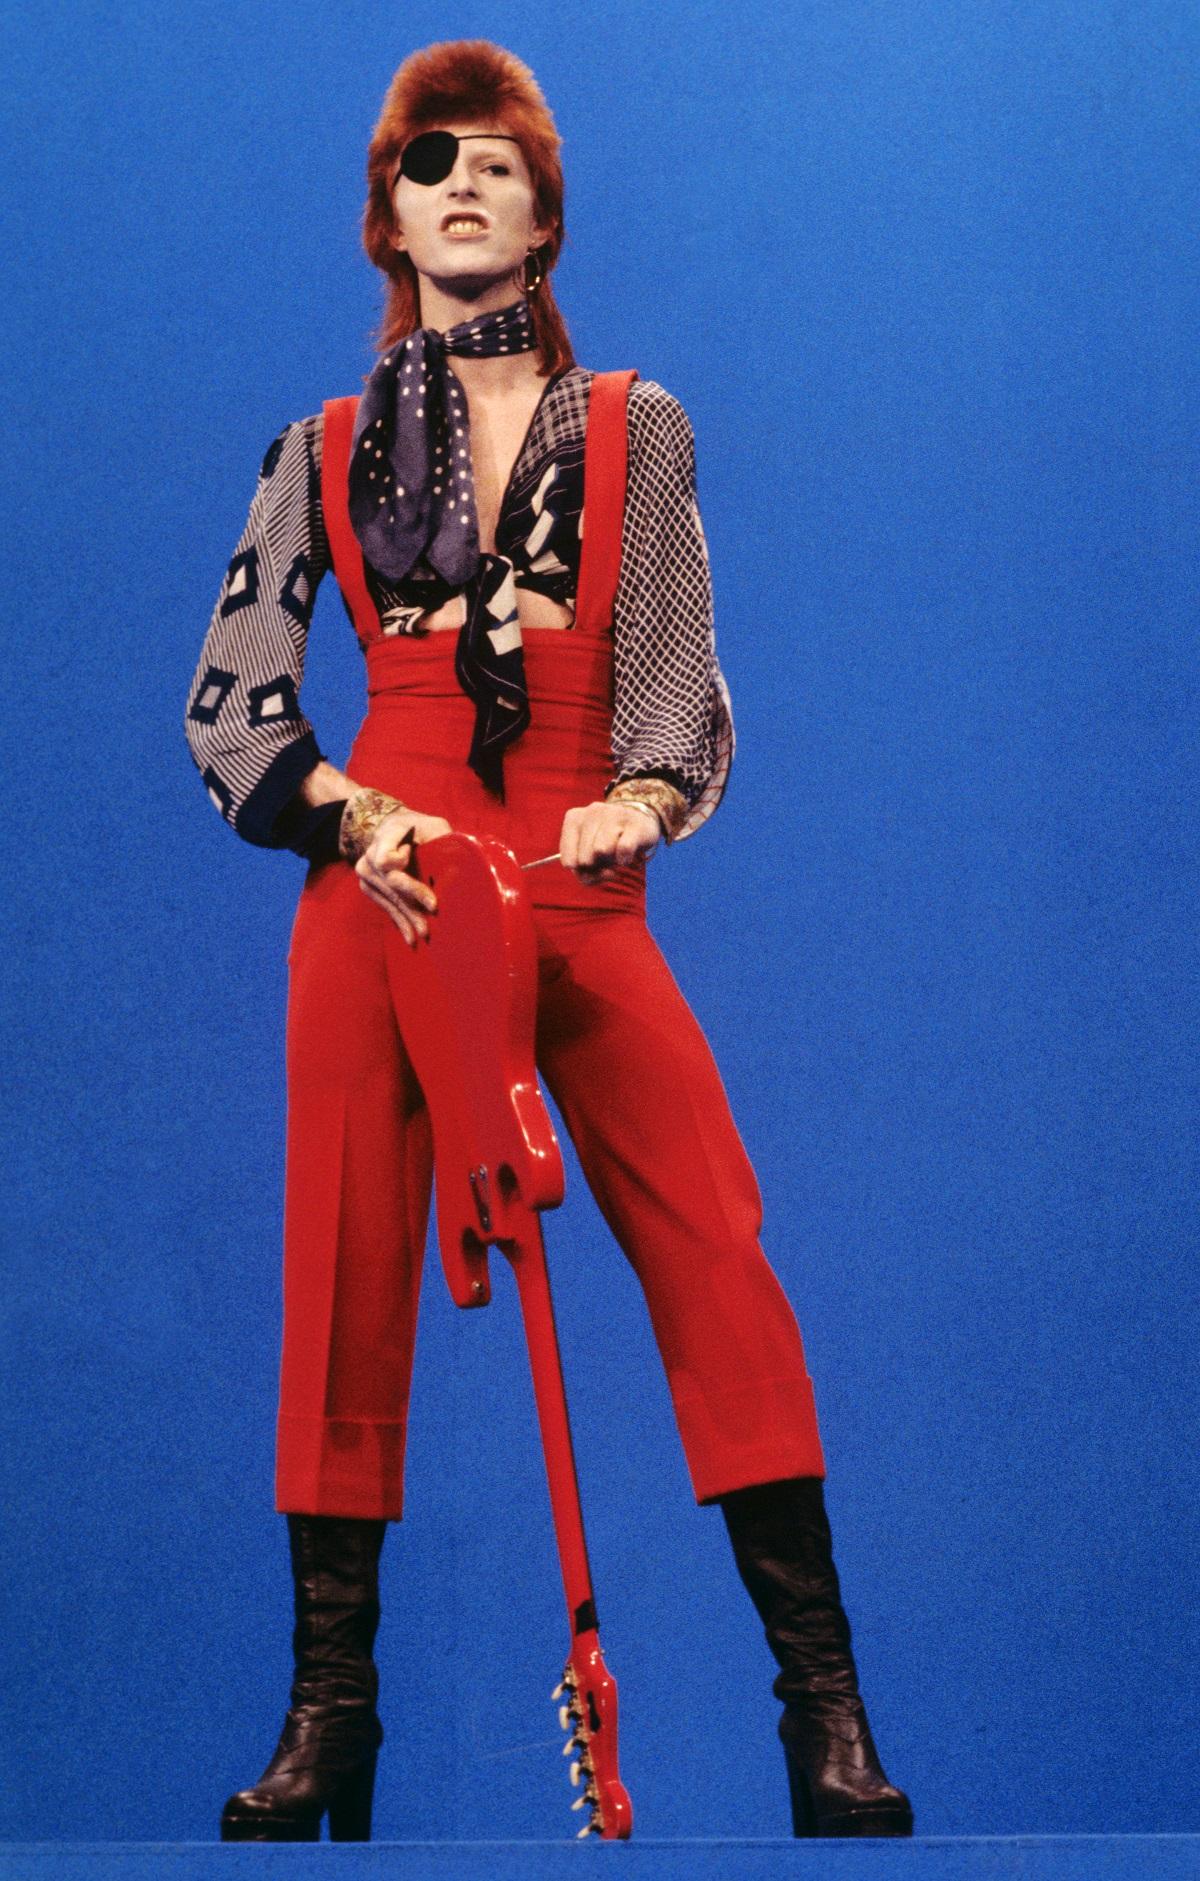 David Bowie wearing an eyepatch performing Rebel Rebel on TopPop in 1974